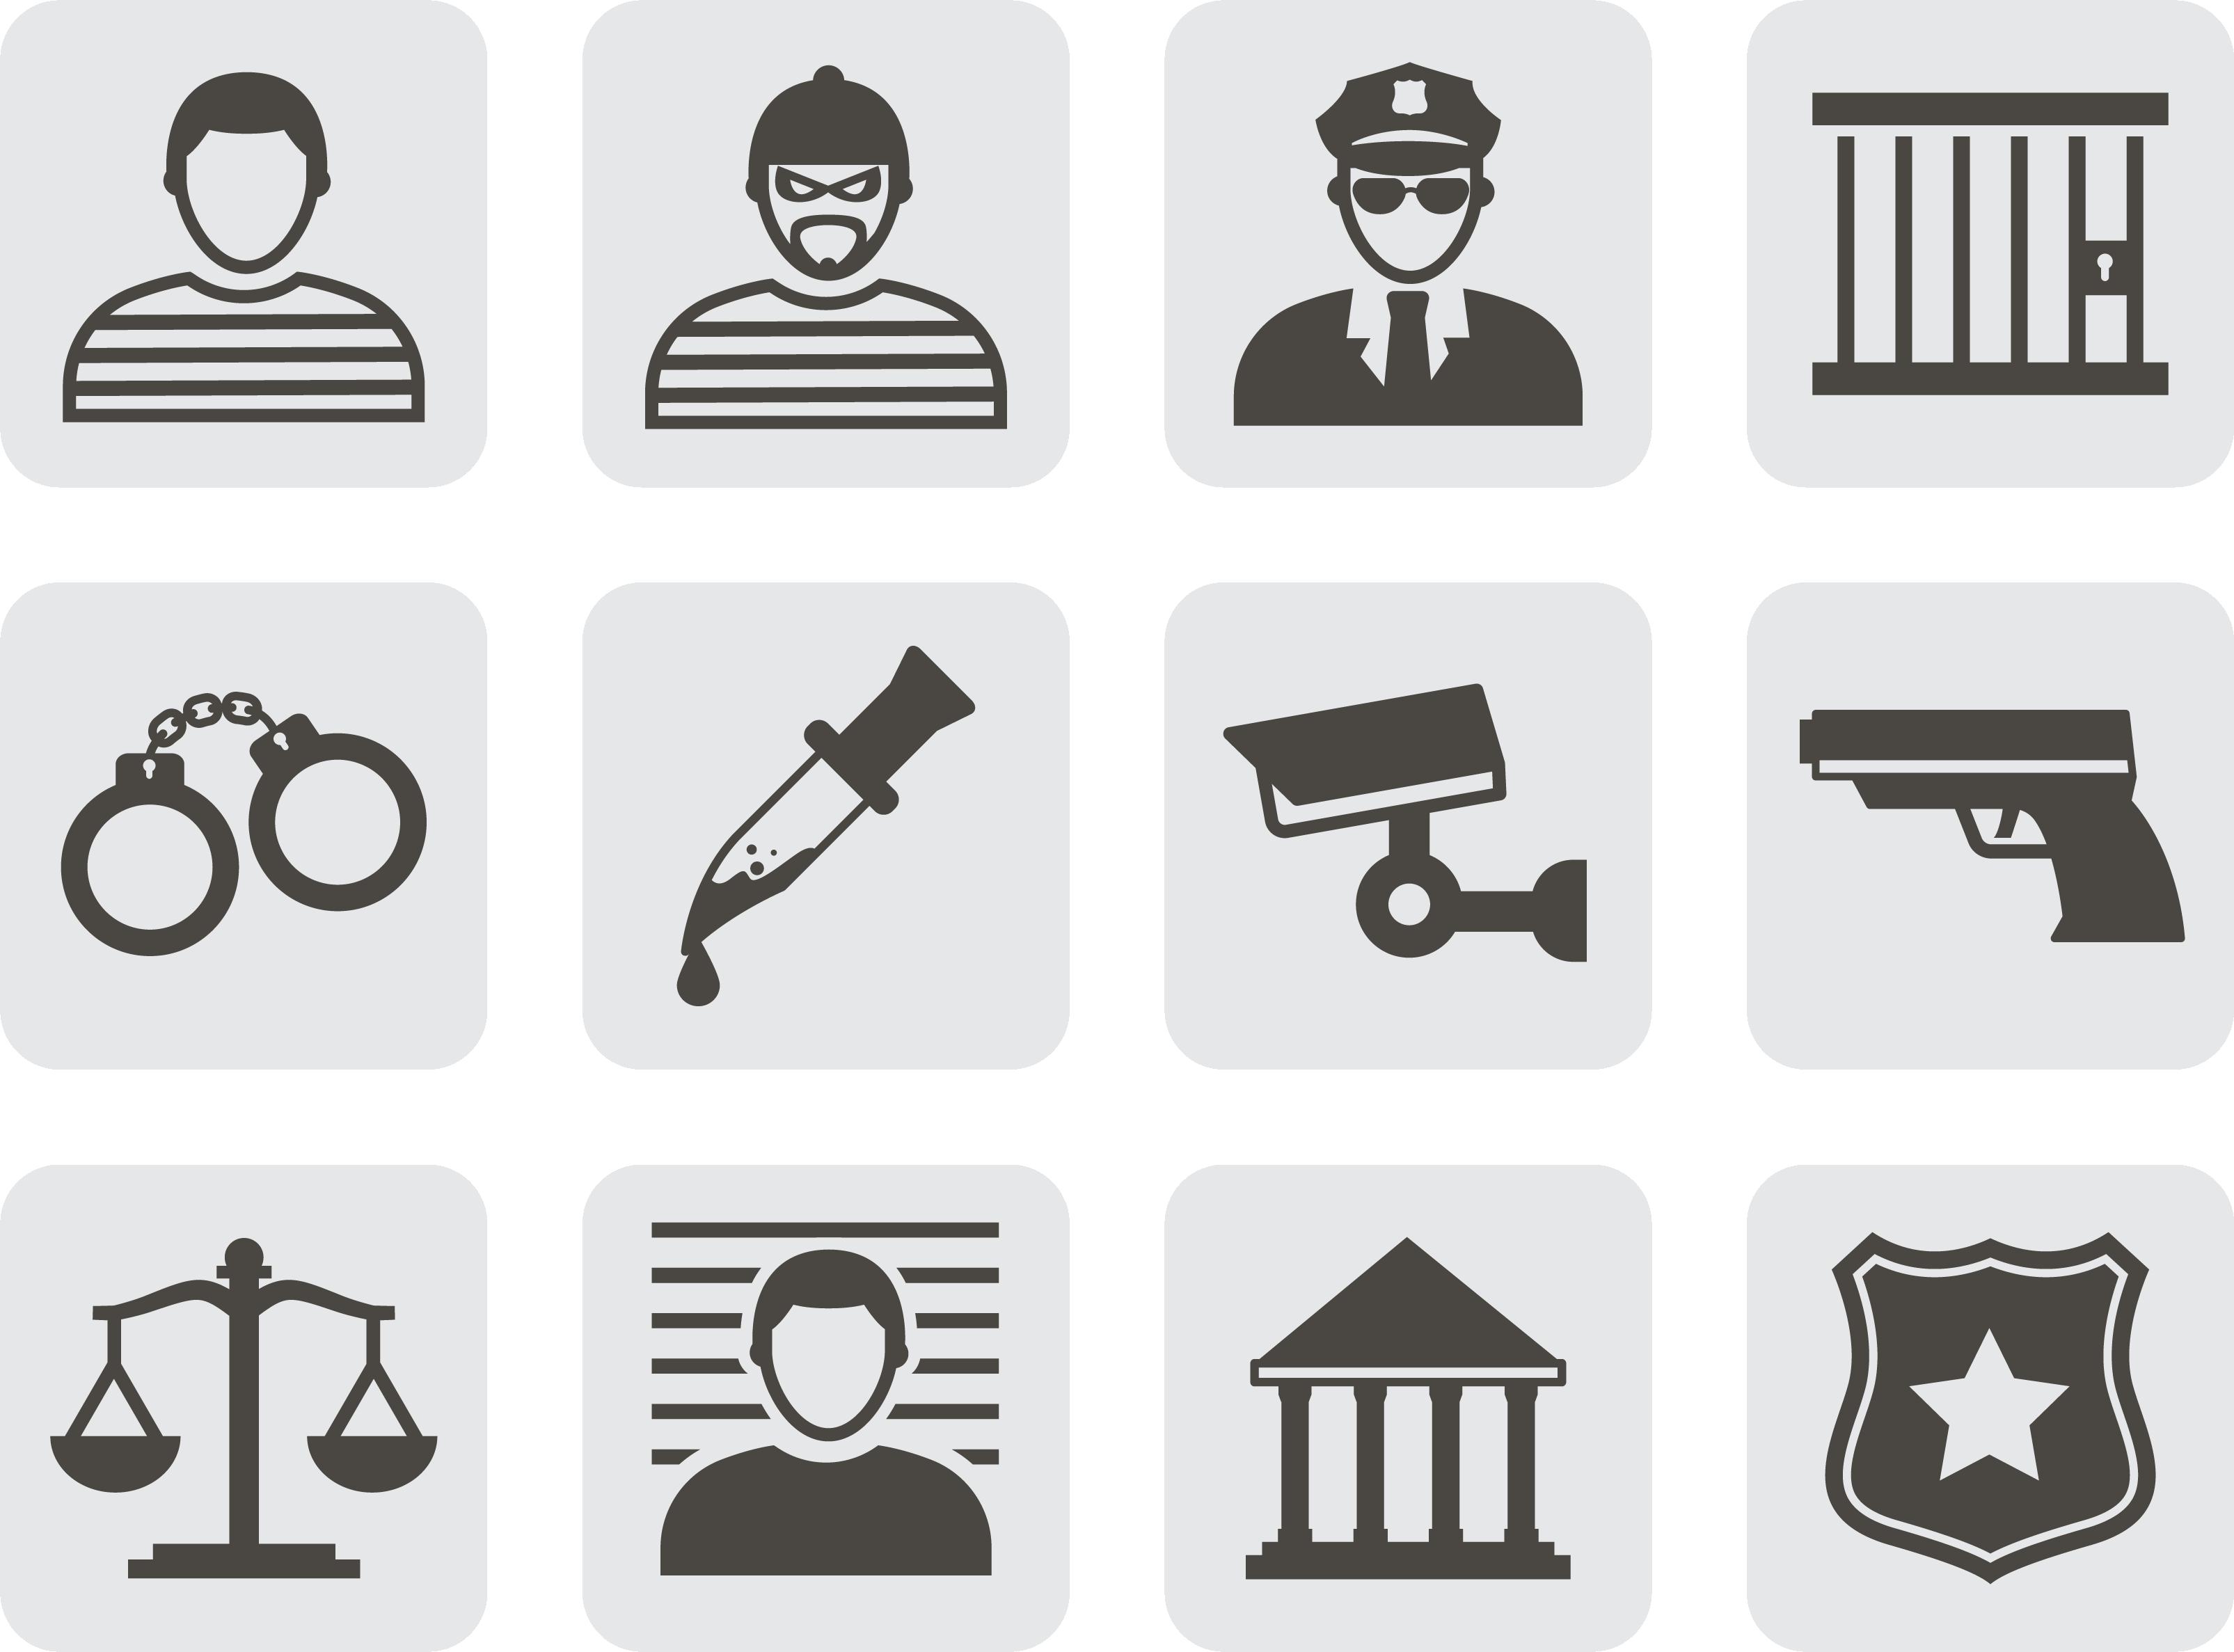 Handcuffs clipart criminal court. Crime icon police justice